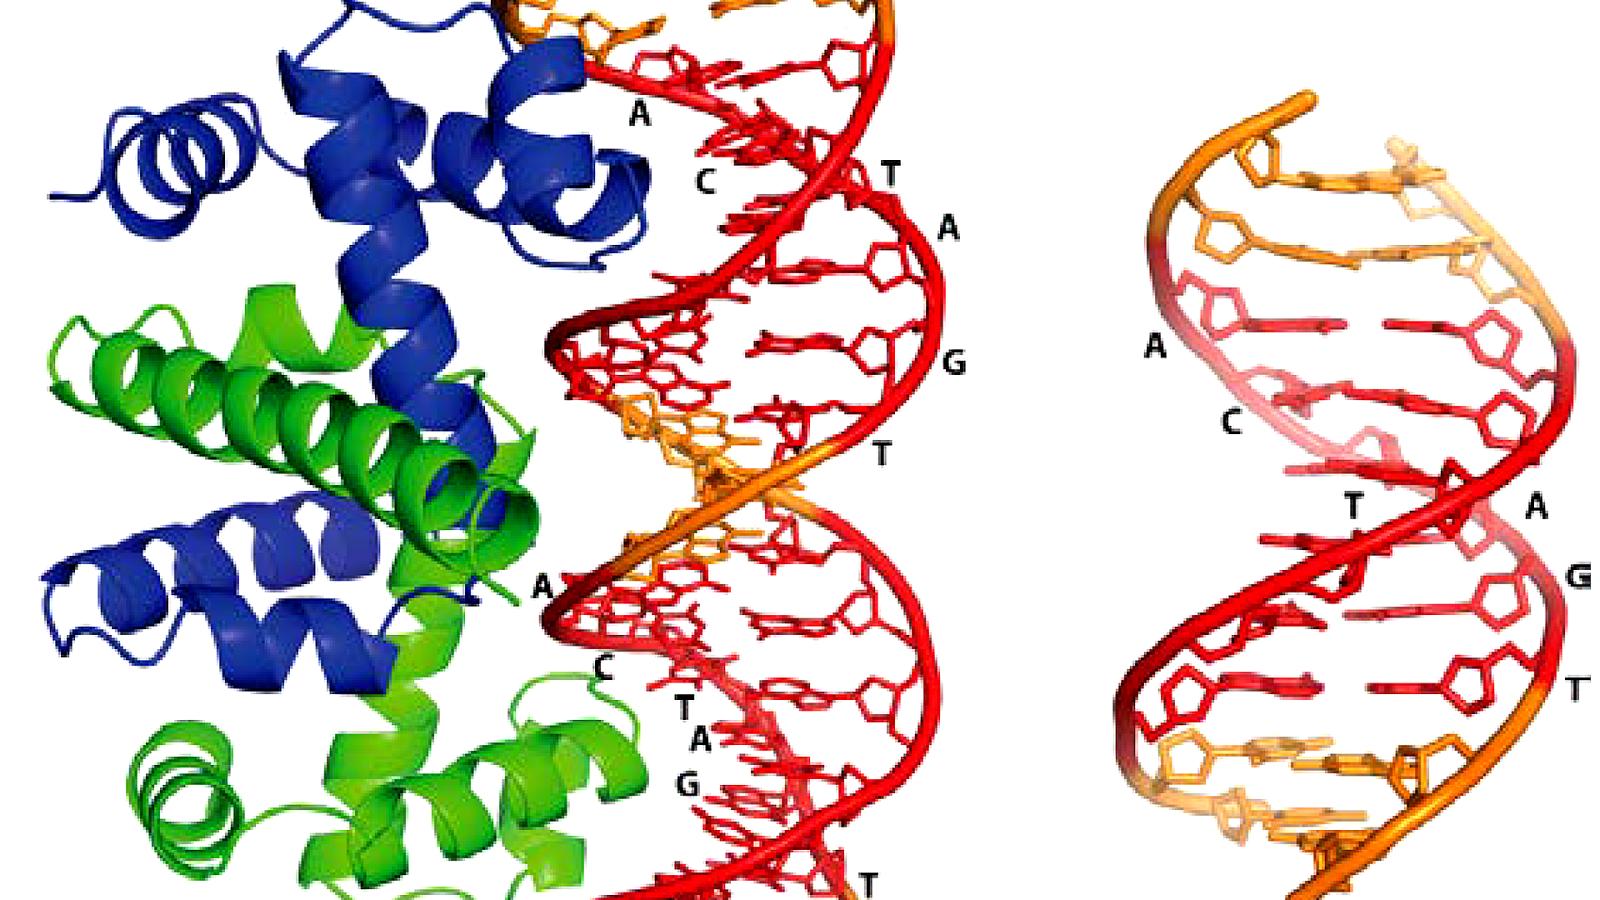 Protein-DNA-Interaktion - Wikipedia